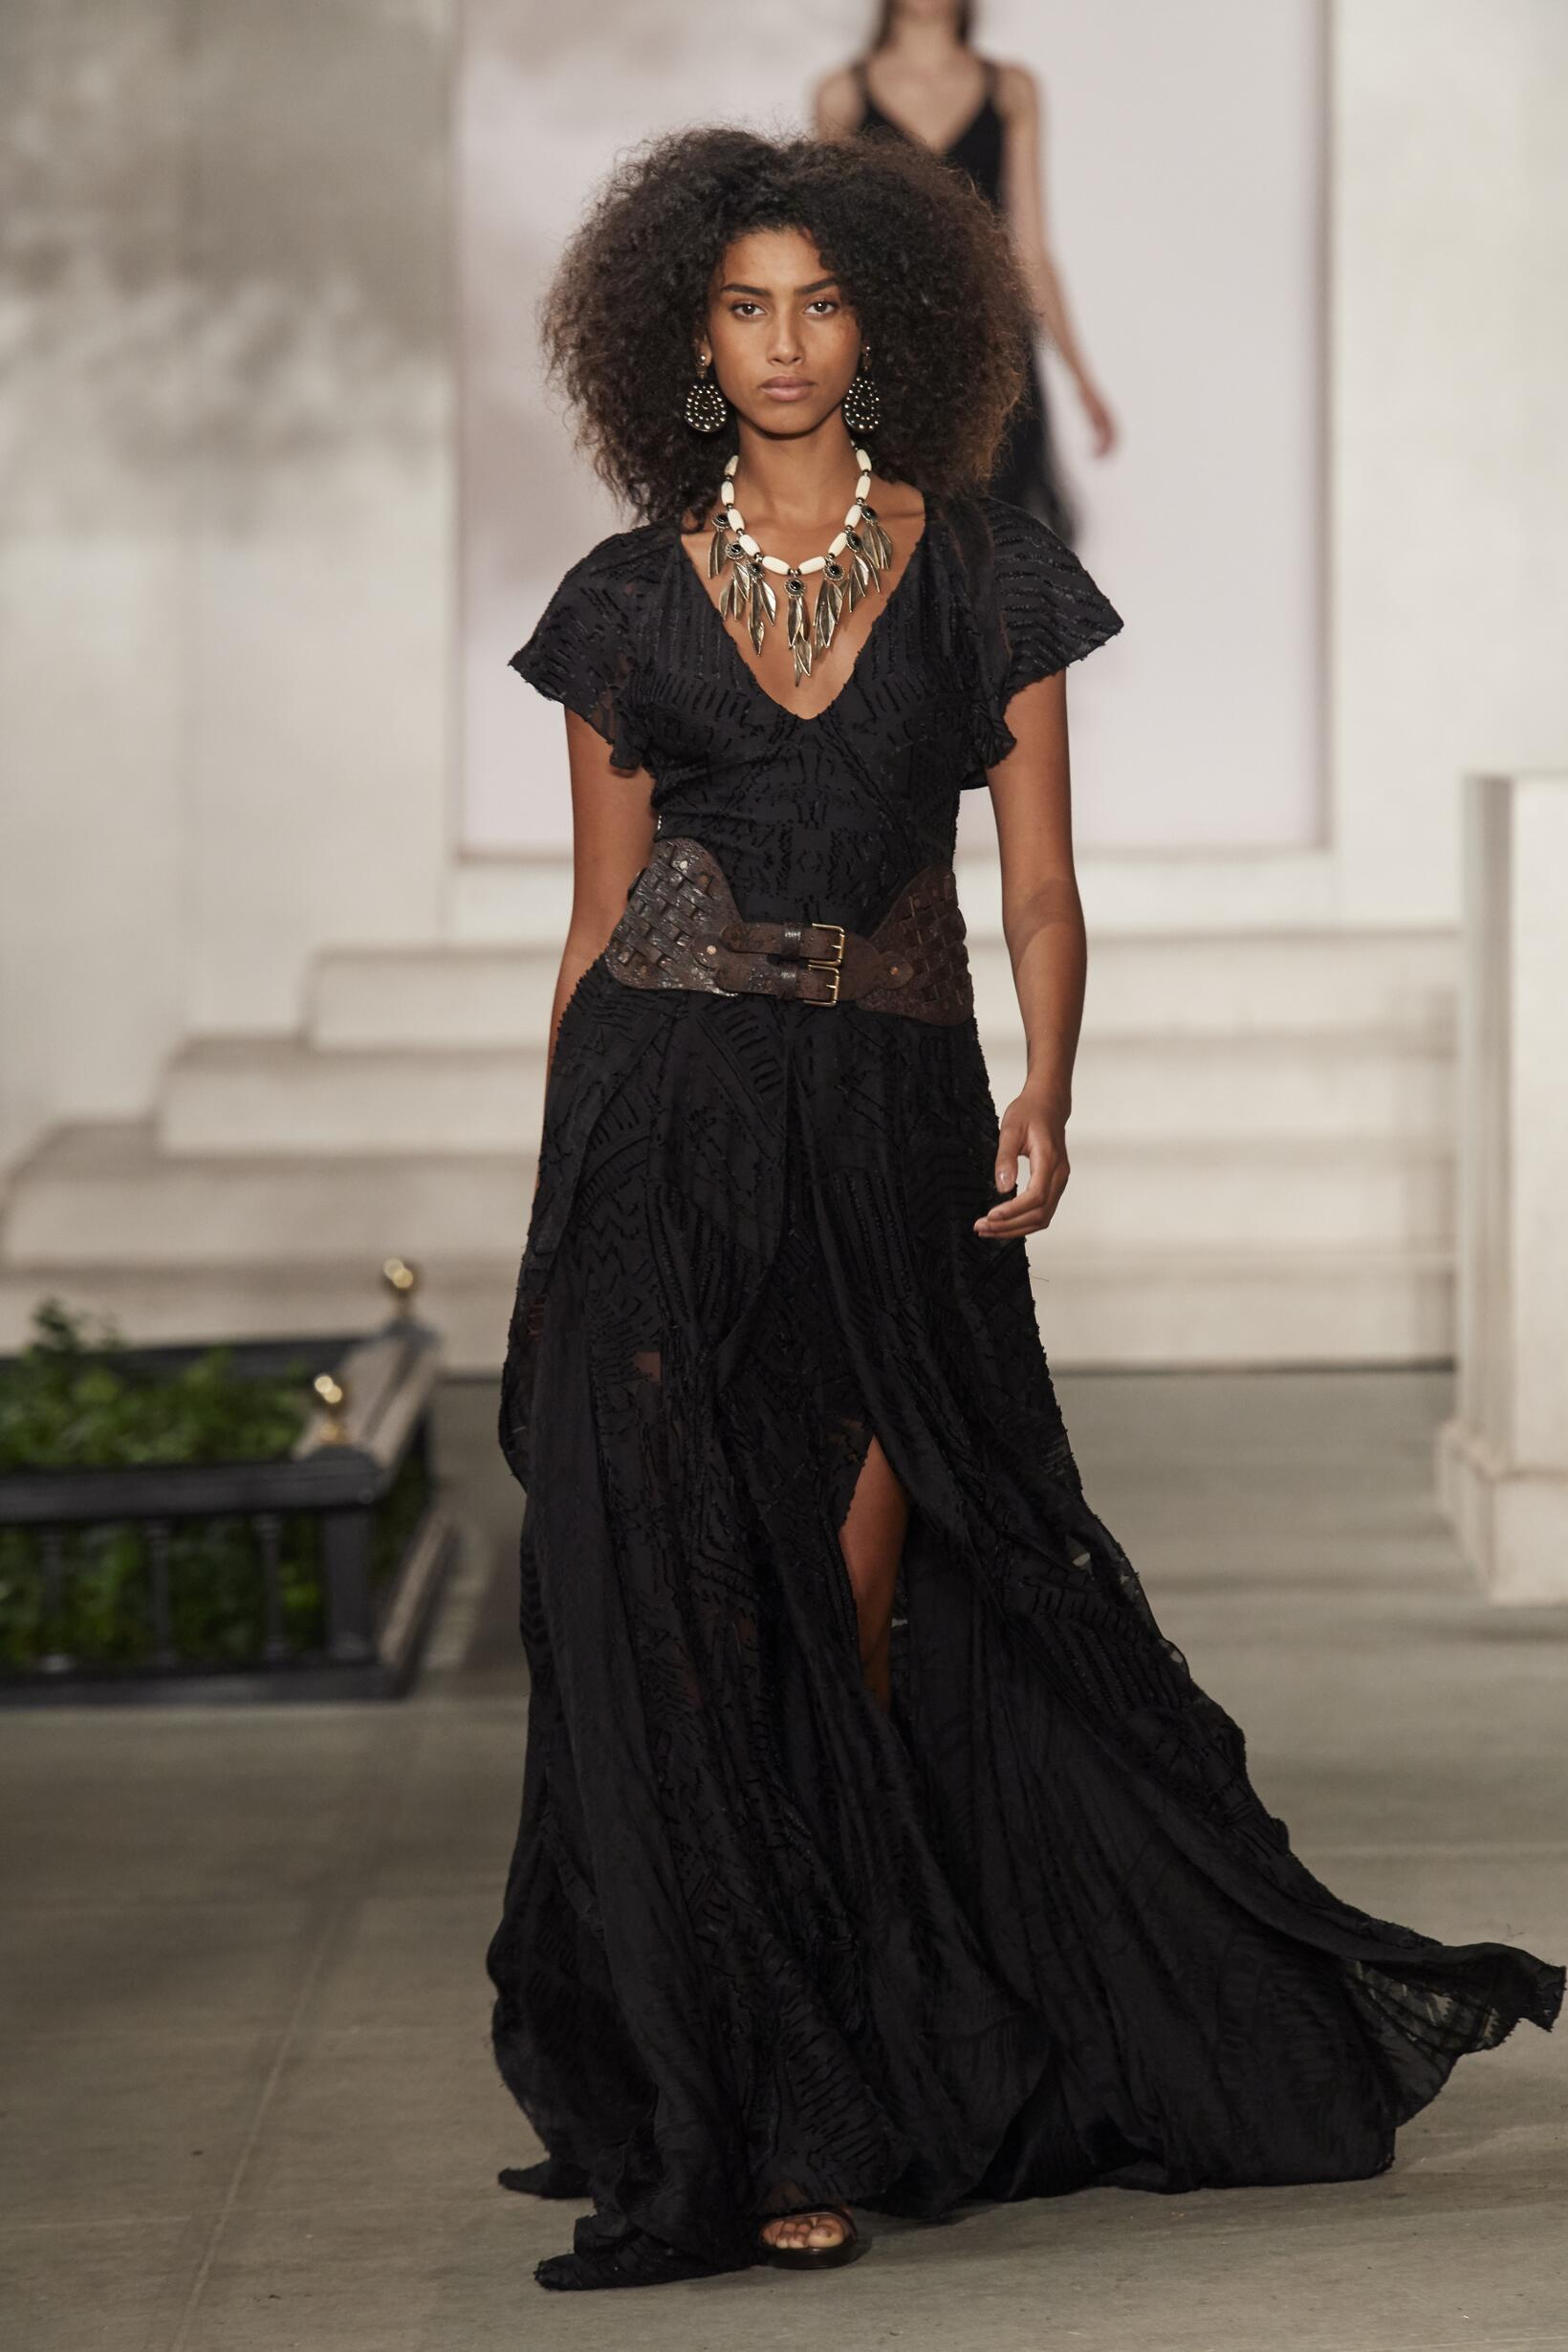 Fashion Model Ralph Lauren Catwalk